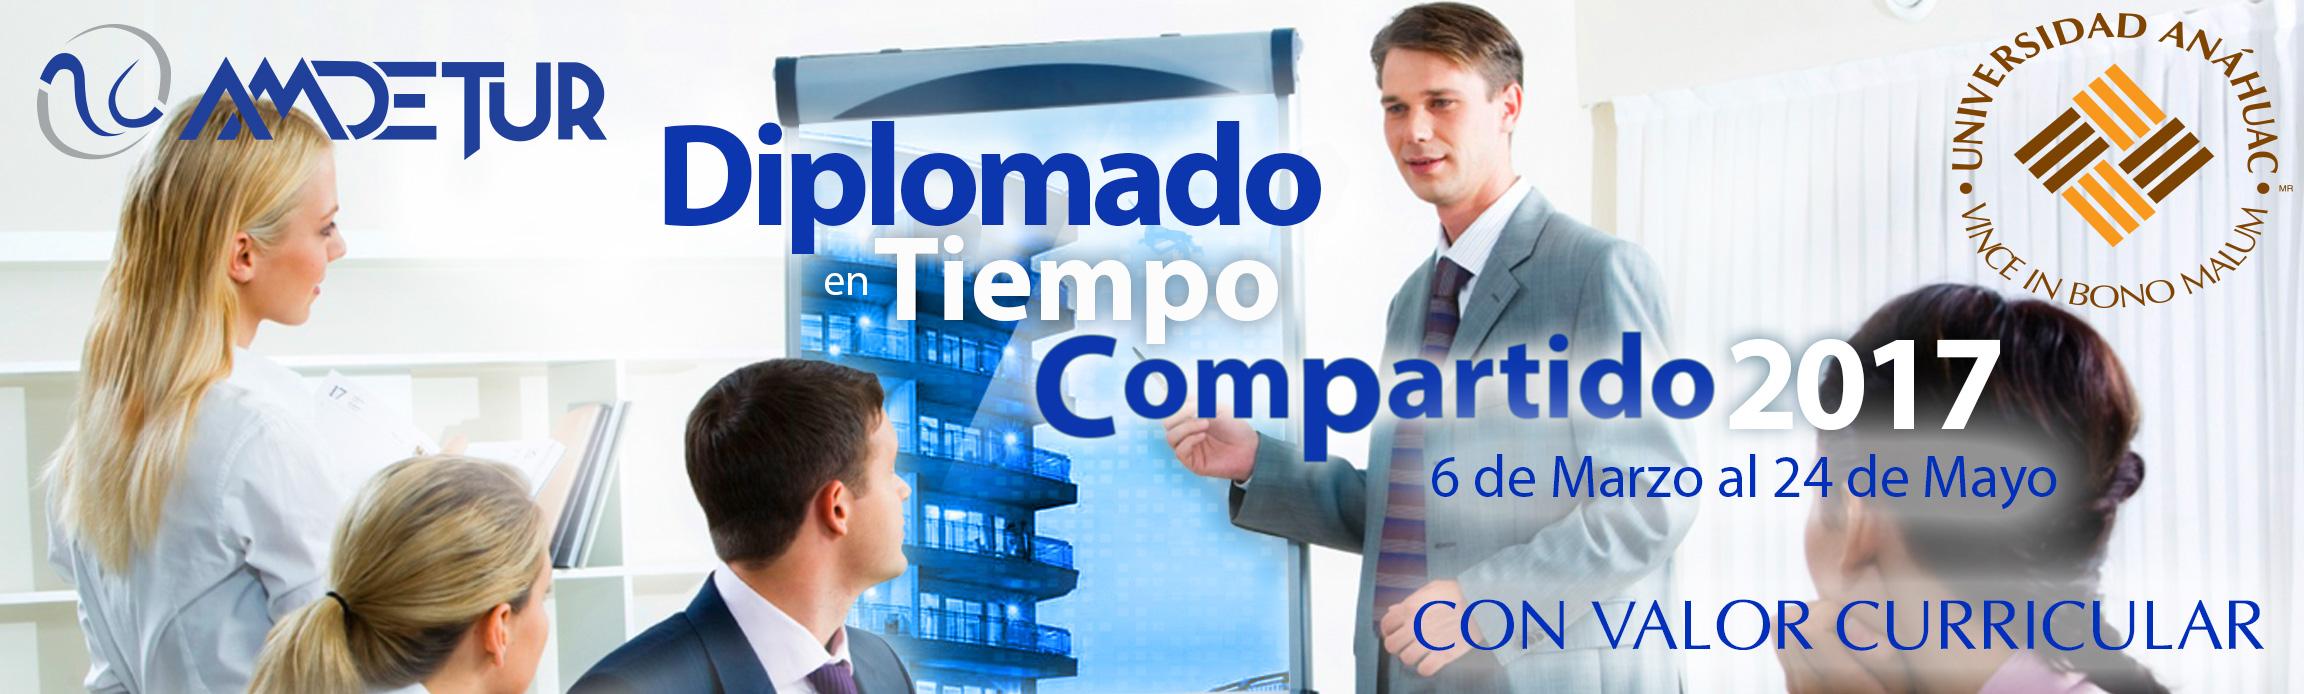 cabecera-diplomado-2017-bis